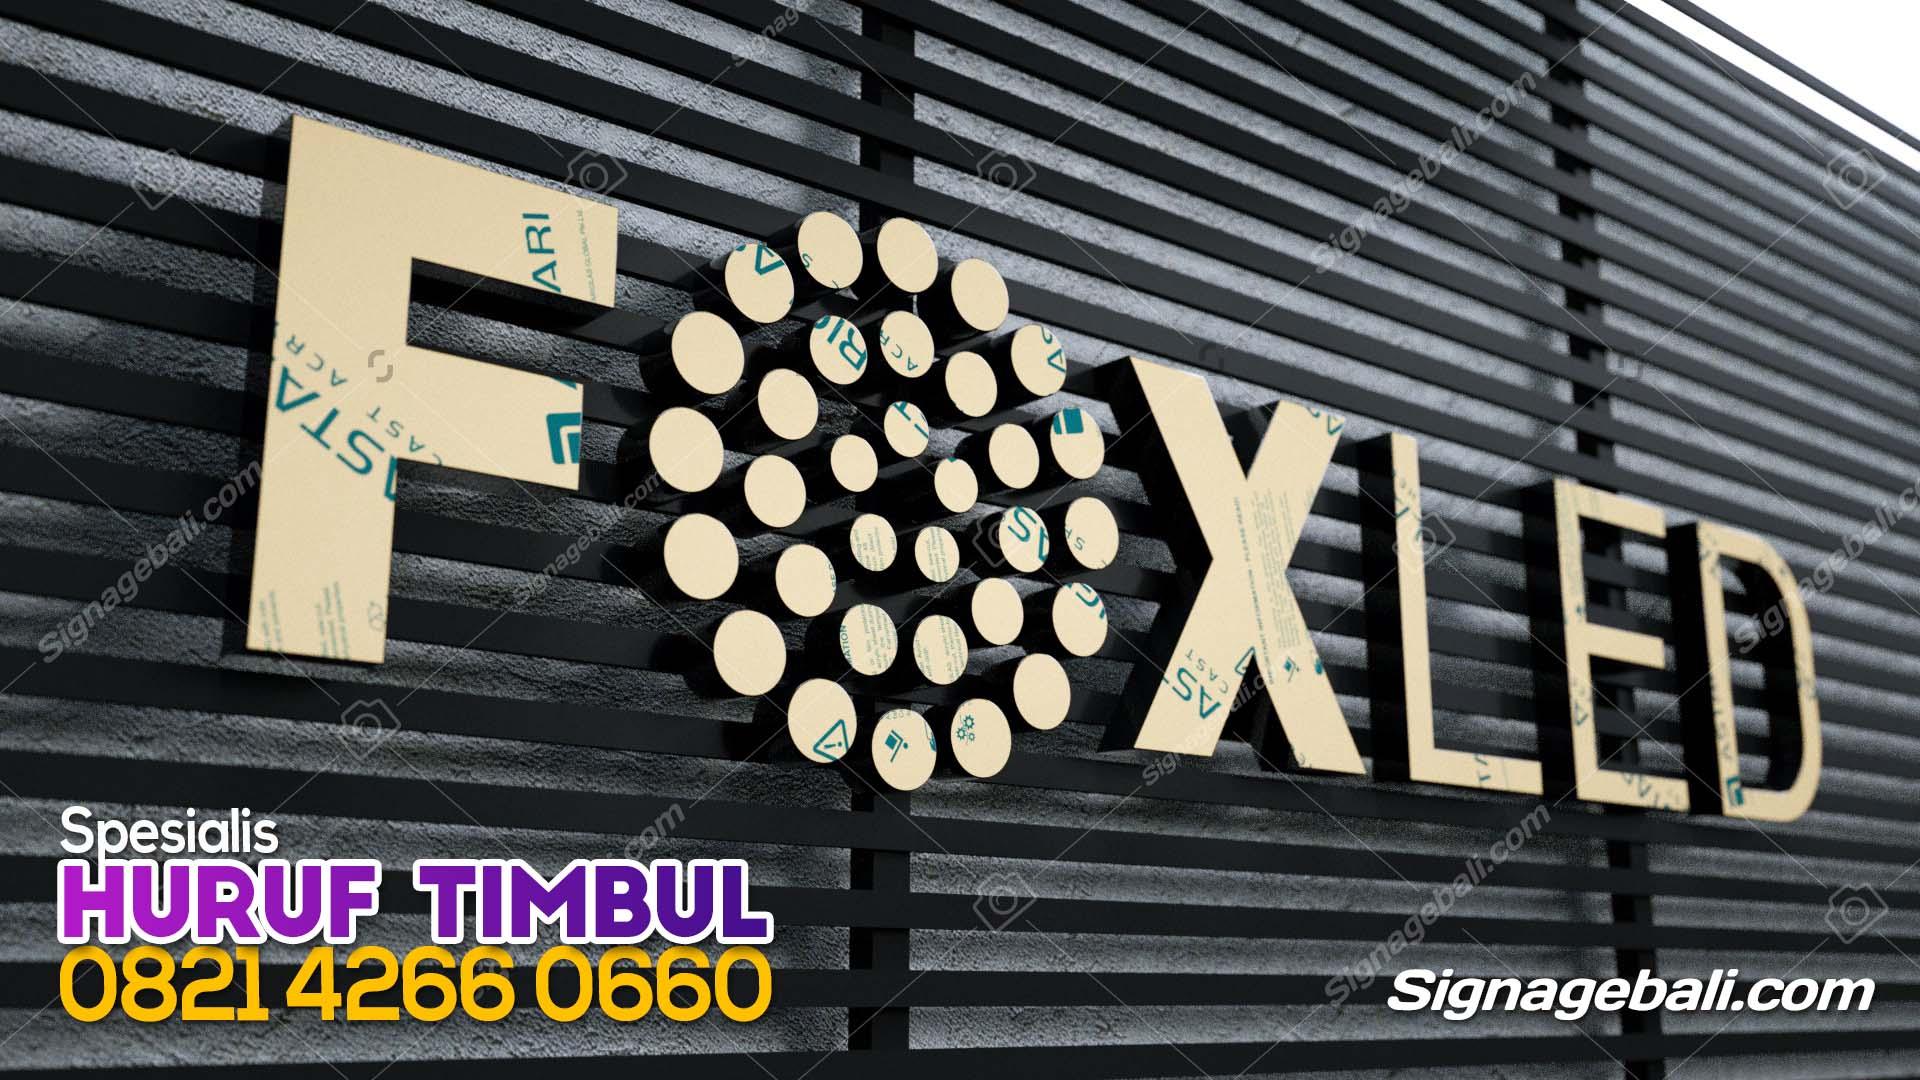 Huruf timbul acrylic FOX LED 2